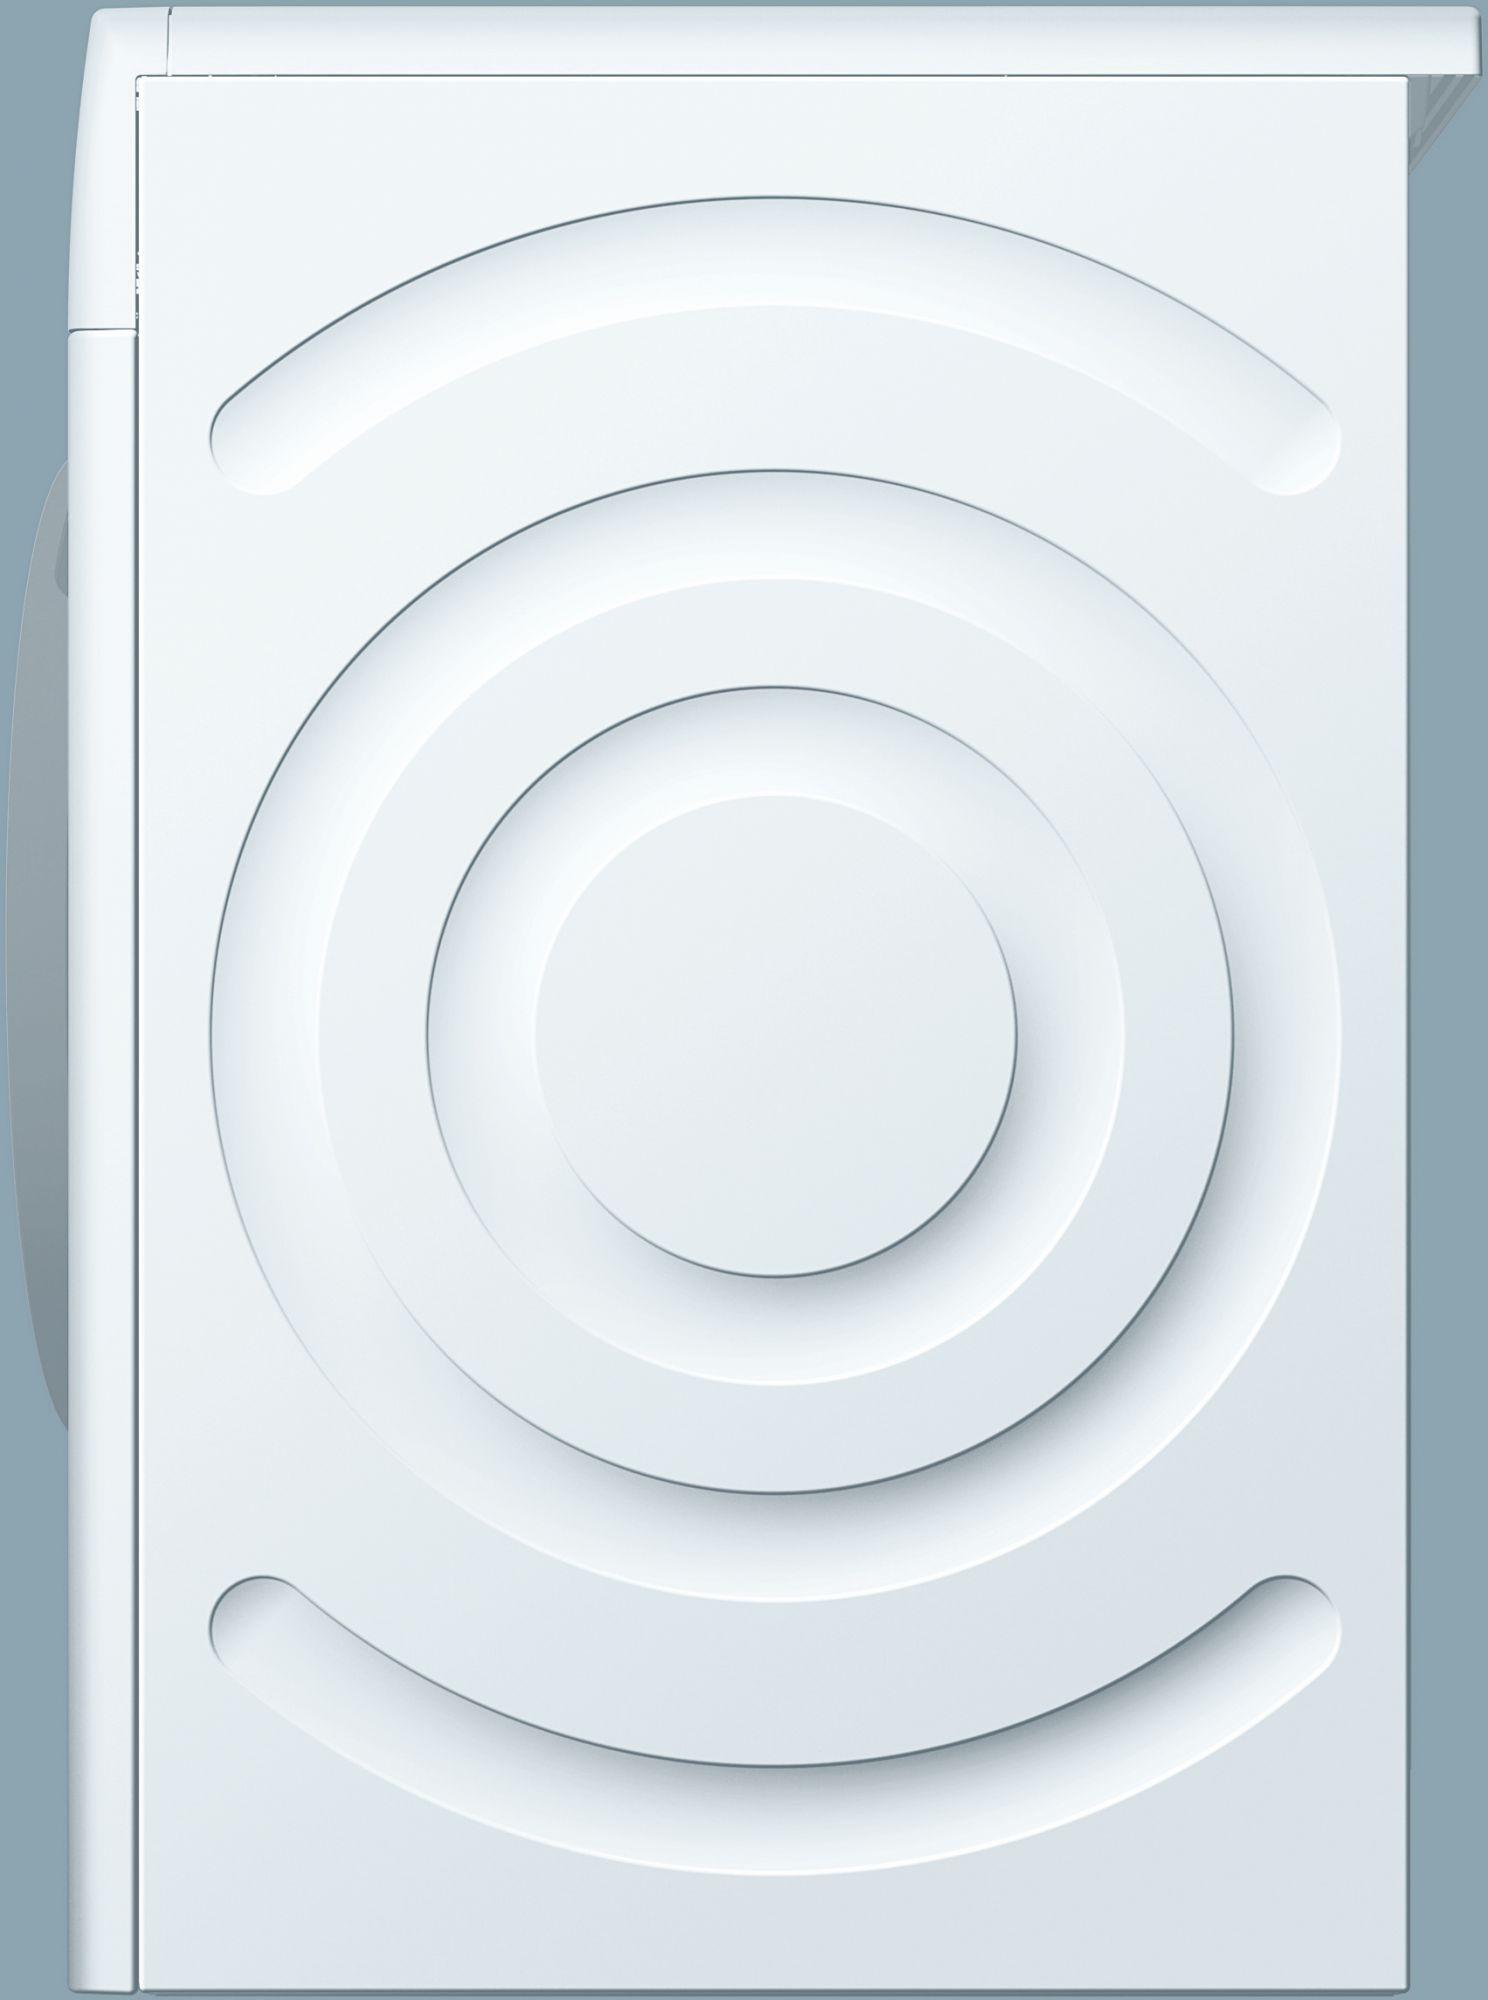 art nr 847027 art nr hersteller wt47w56a ean 4242003707951 einzelpreis 889 00. Black Bedroom Furniture Sets. Home Design Ideas